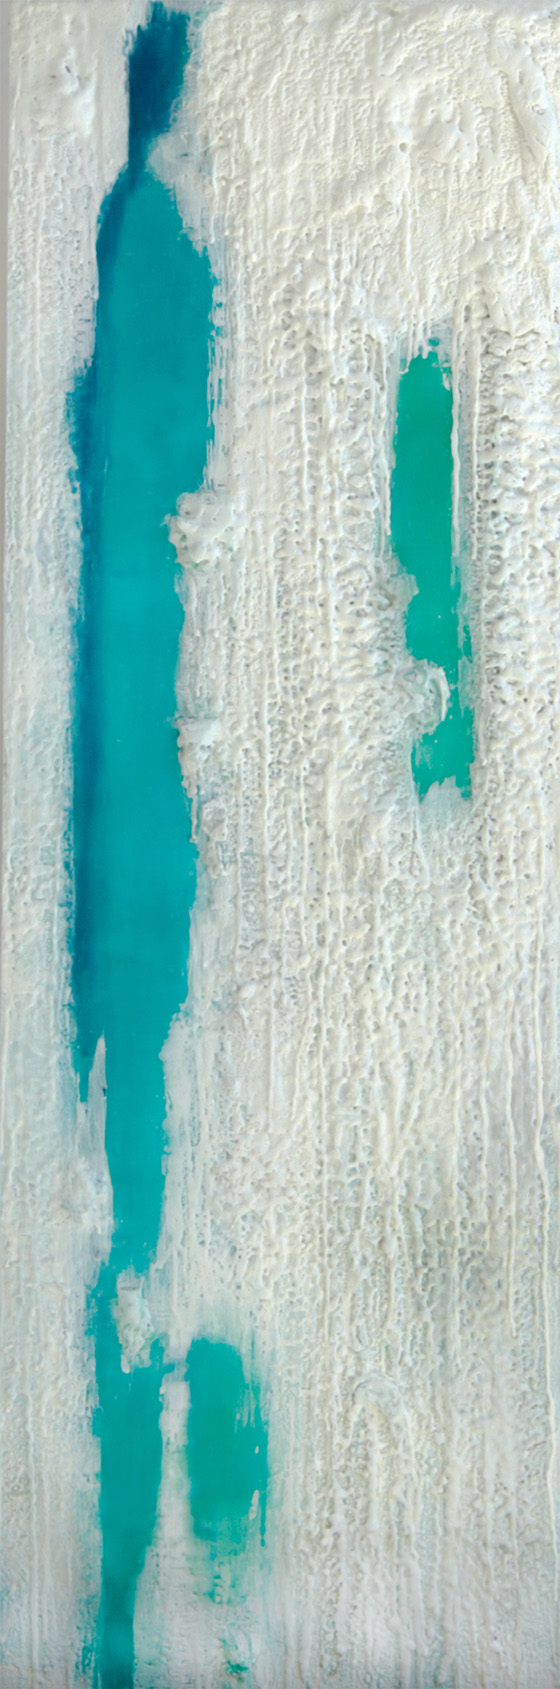 ID473931-Glacier-1-Rae-Broyles.jpg